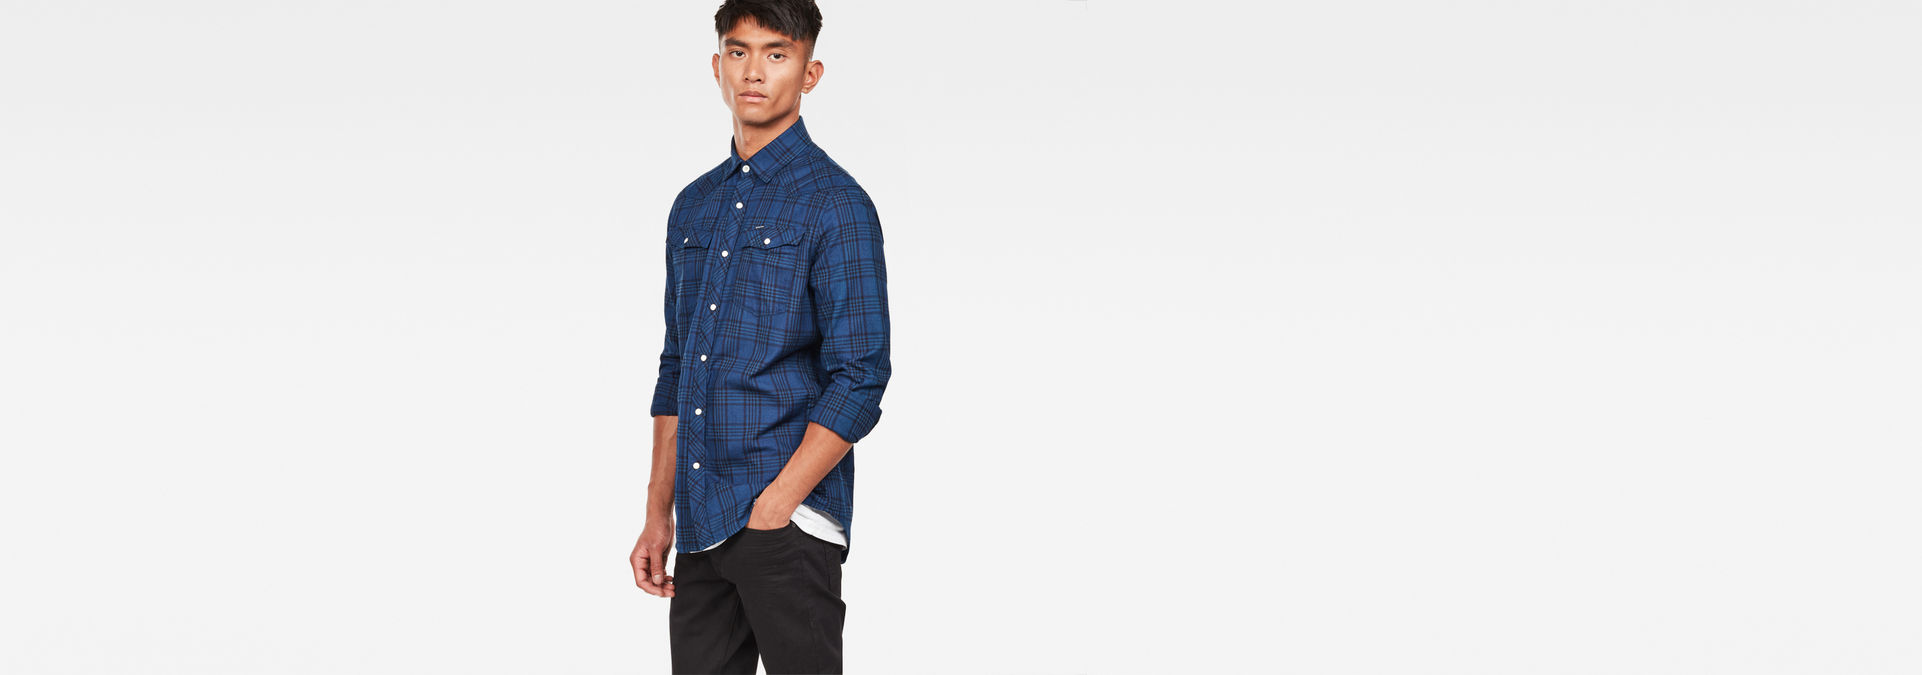 G-Star Men/'s Shirt 3301 Slim Fit Navy Blue M